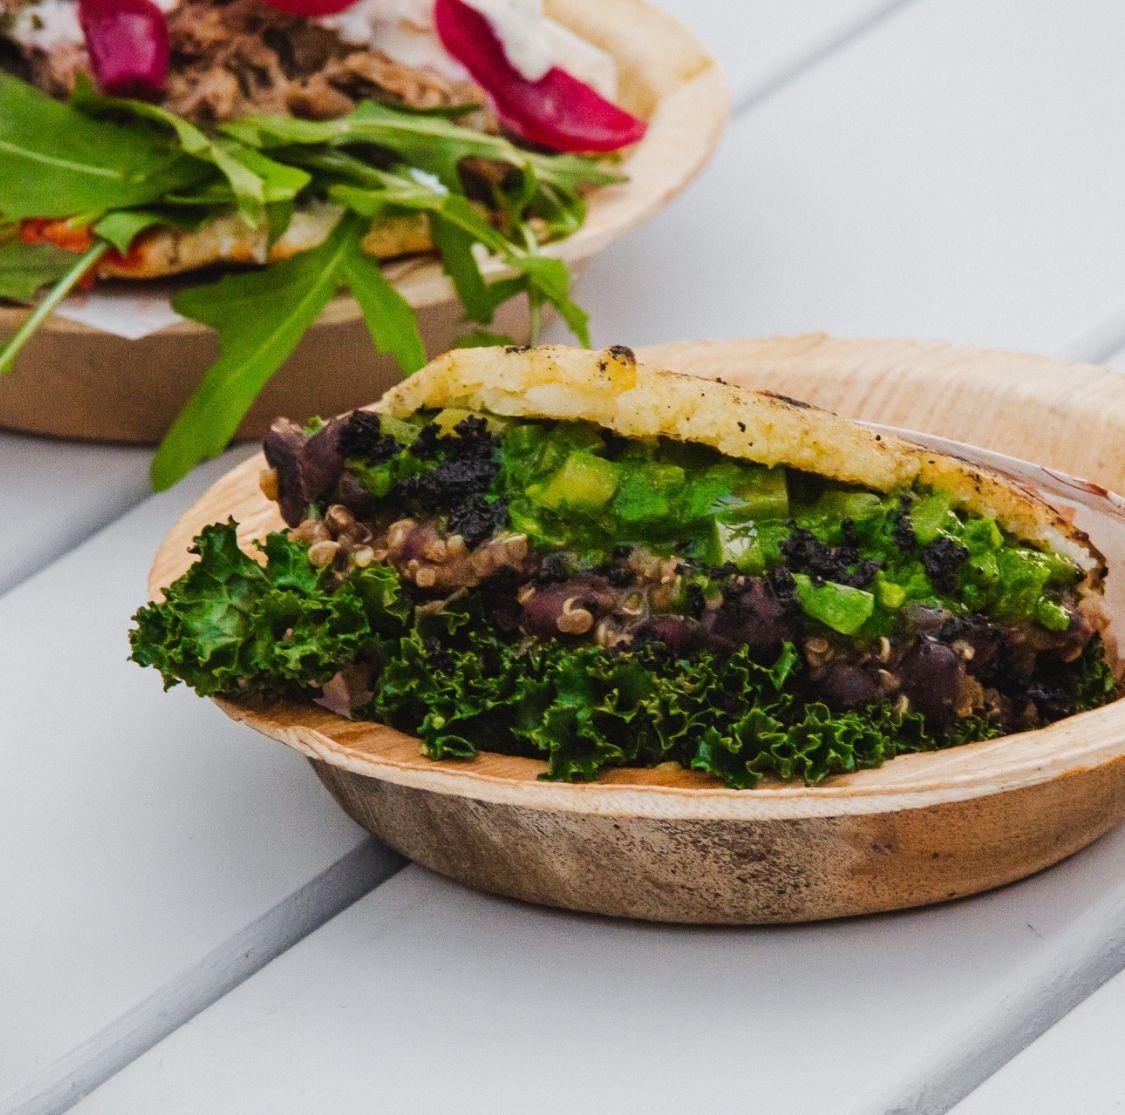 Mar and Tierra vegetarian arepas - Avocado, grilled kale, quinoa, beans